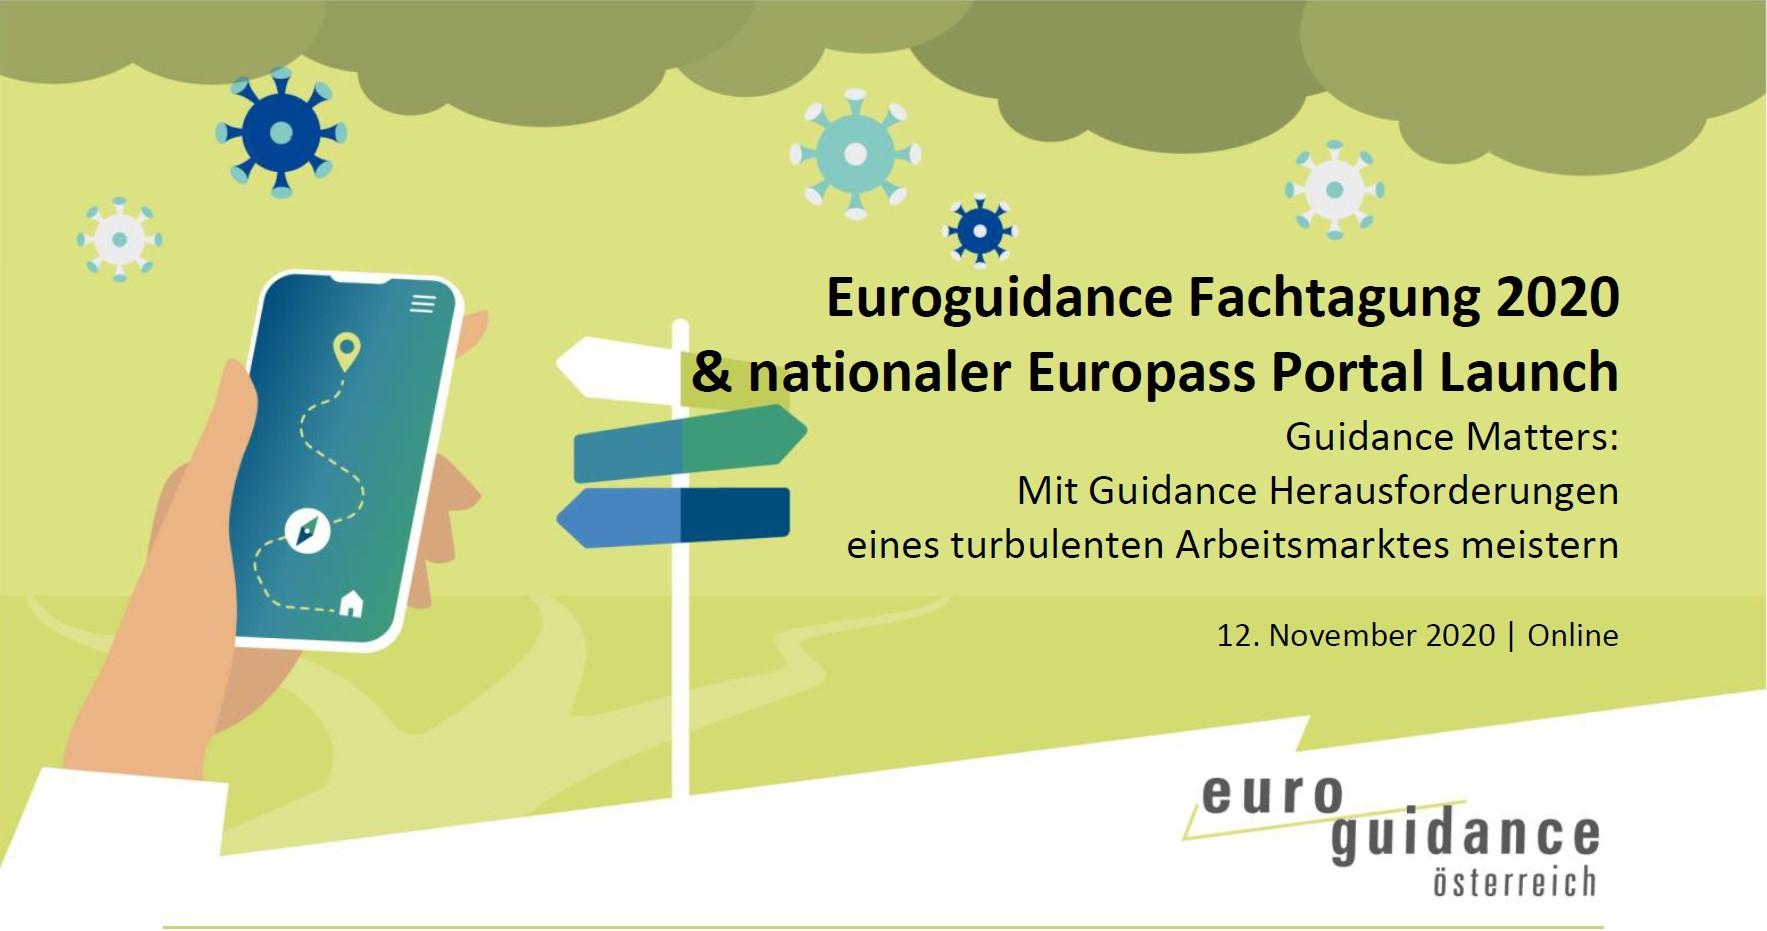 euroguidance fachtagung